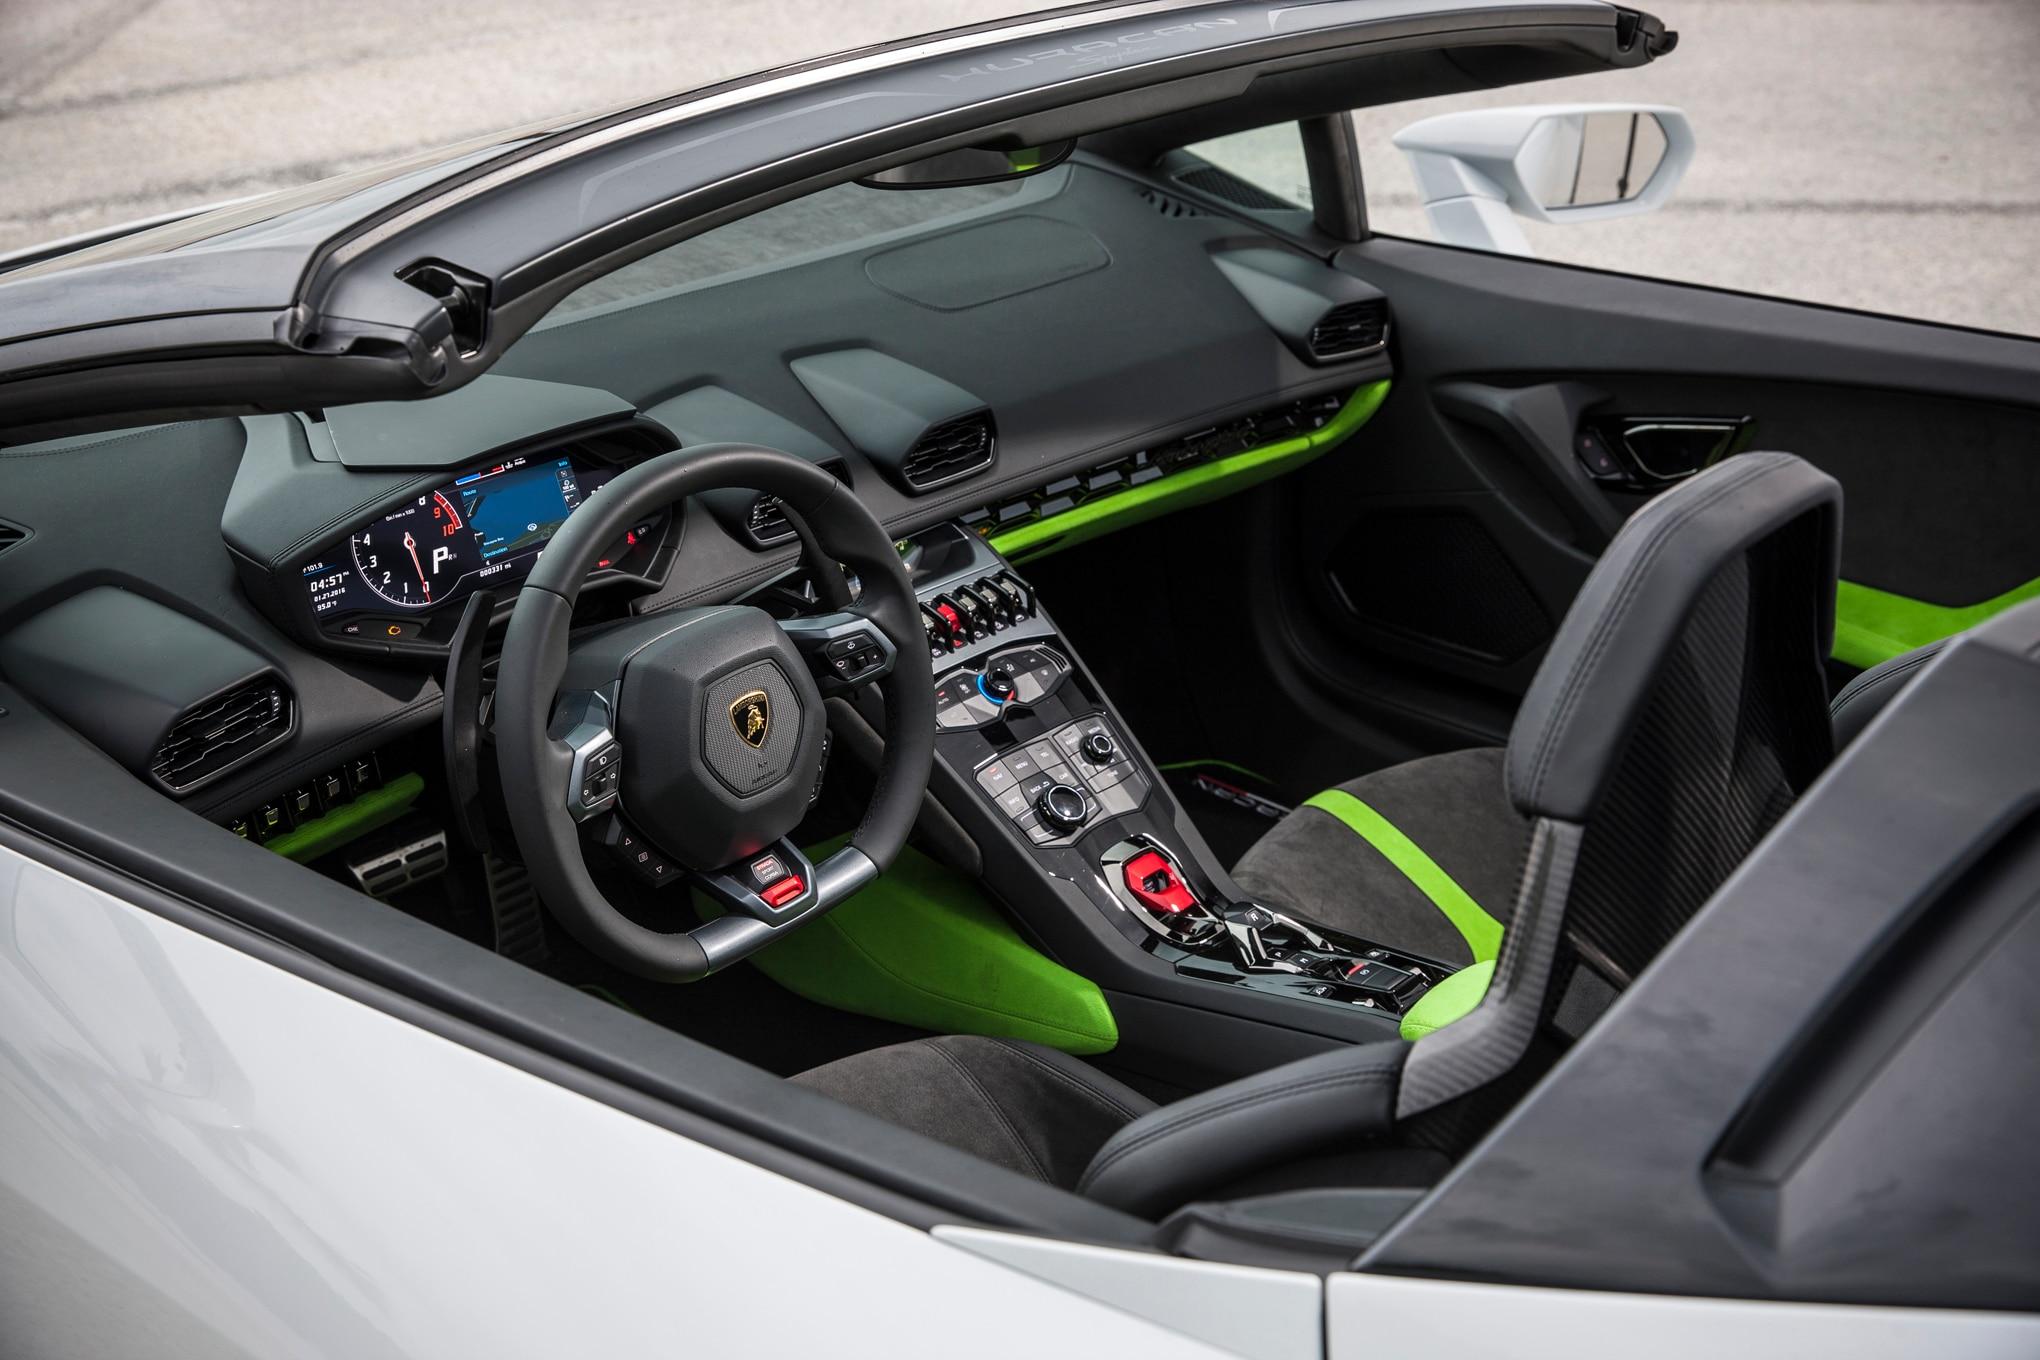 2016 Lamborghini Huracan Spyder Review | Automobile Magazine